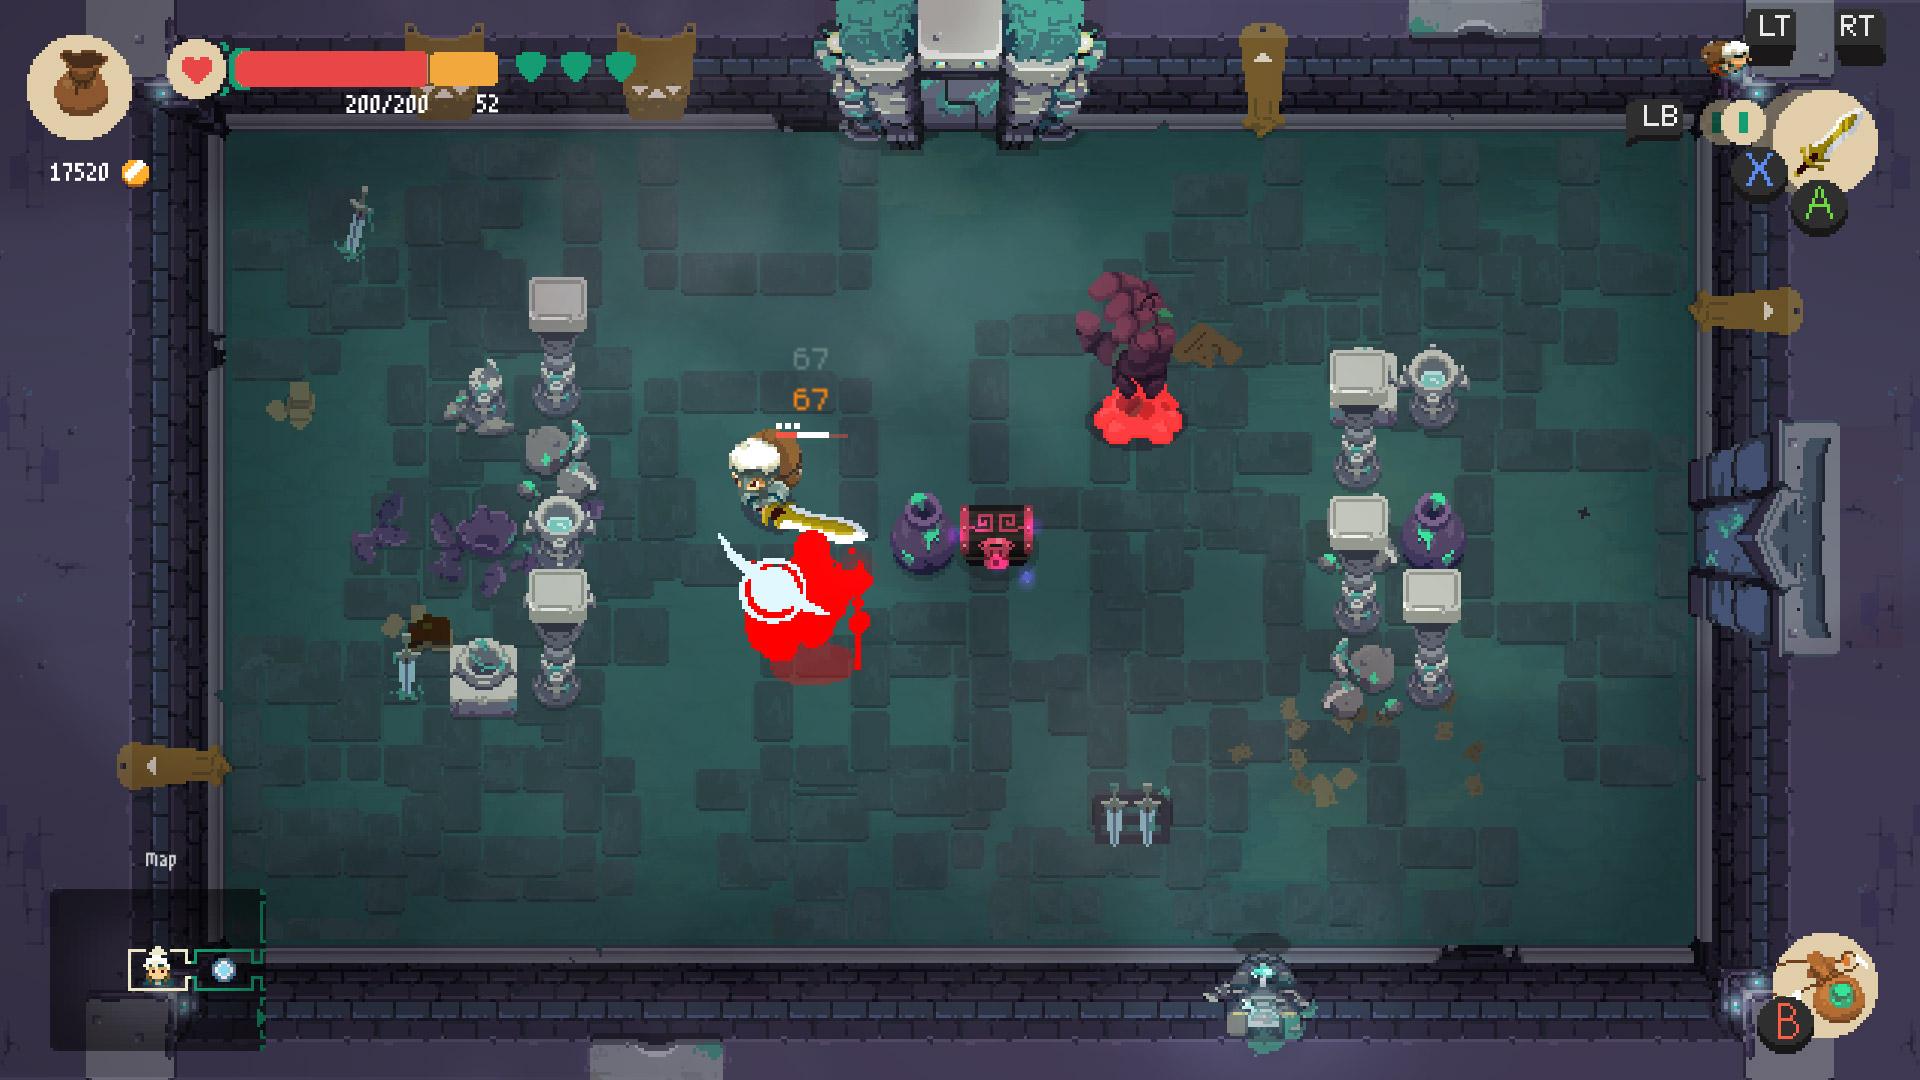 moonlighter_screenshot-9.jpg